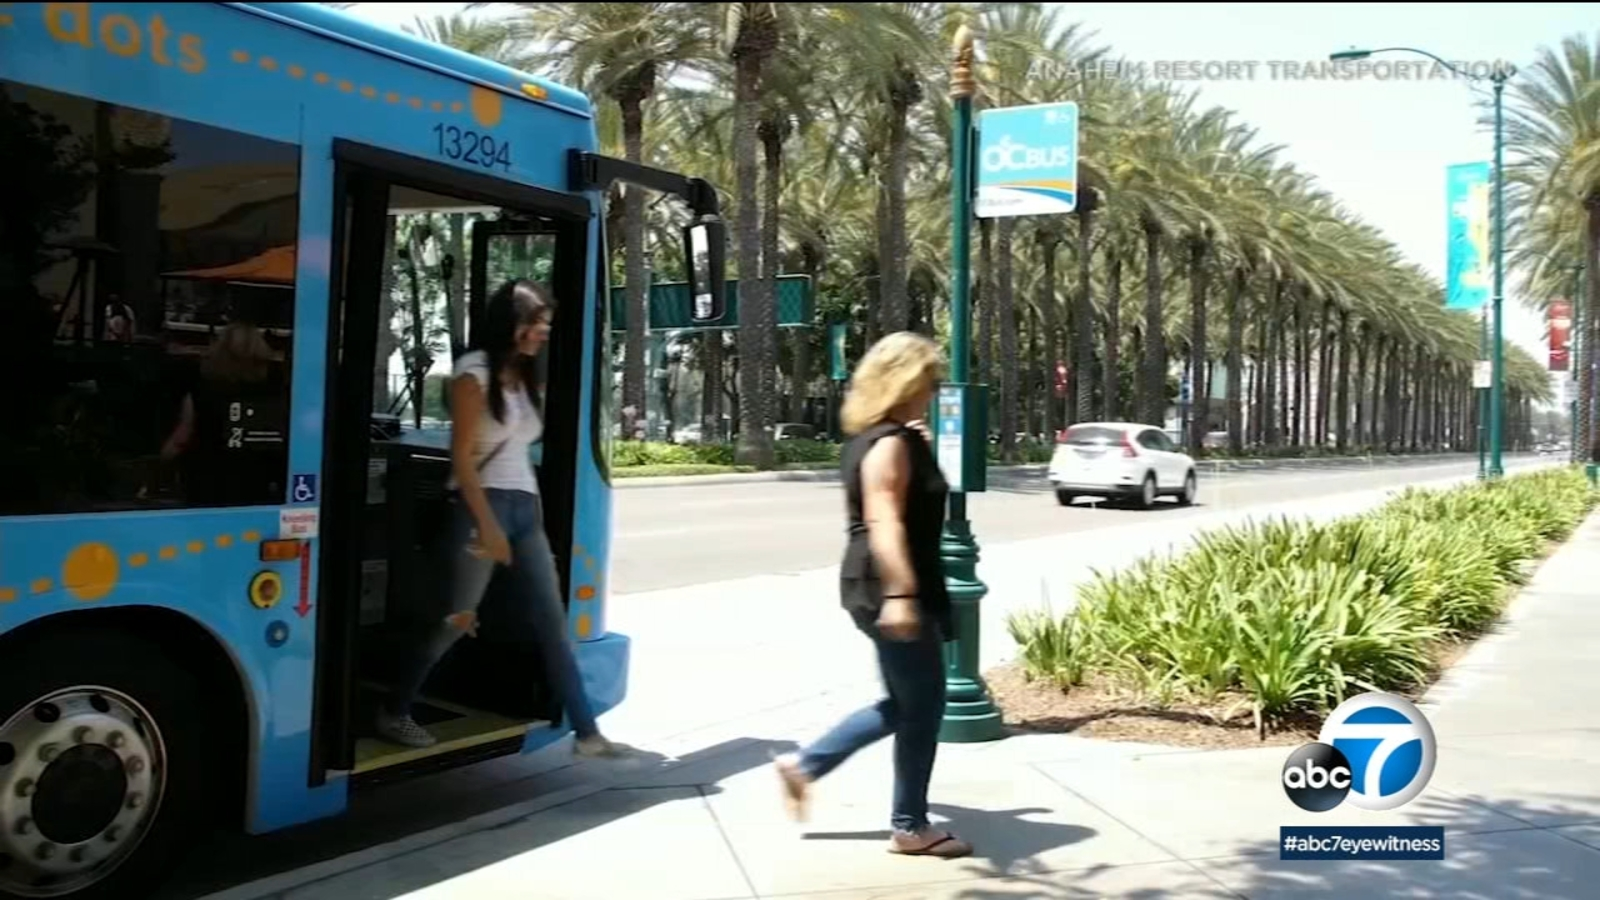 Star Wars: Galaxy's Edge: Anaheim hopes transportation app helps with Disneyland crowds